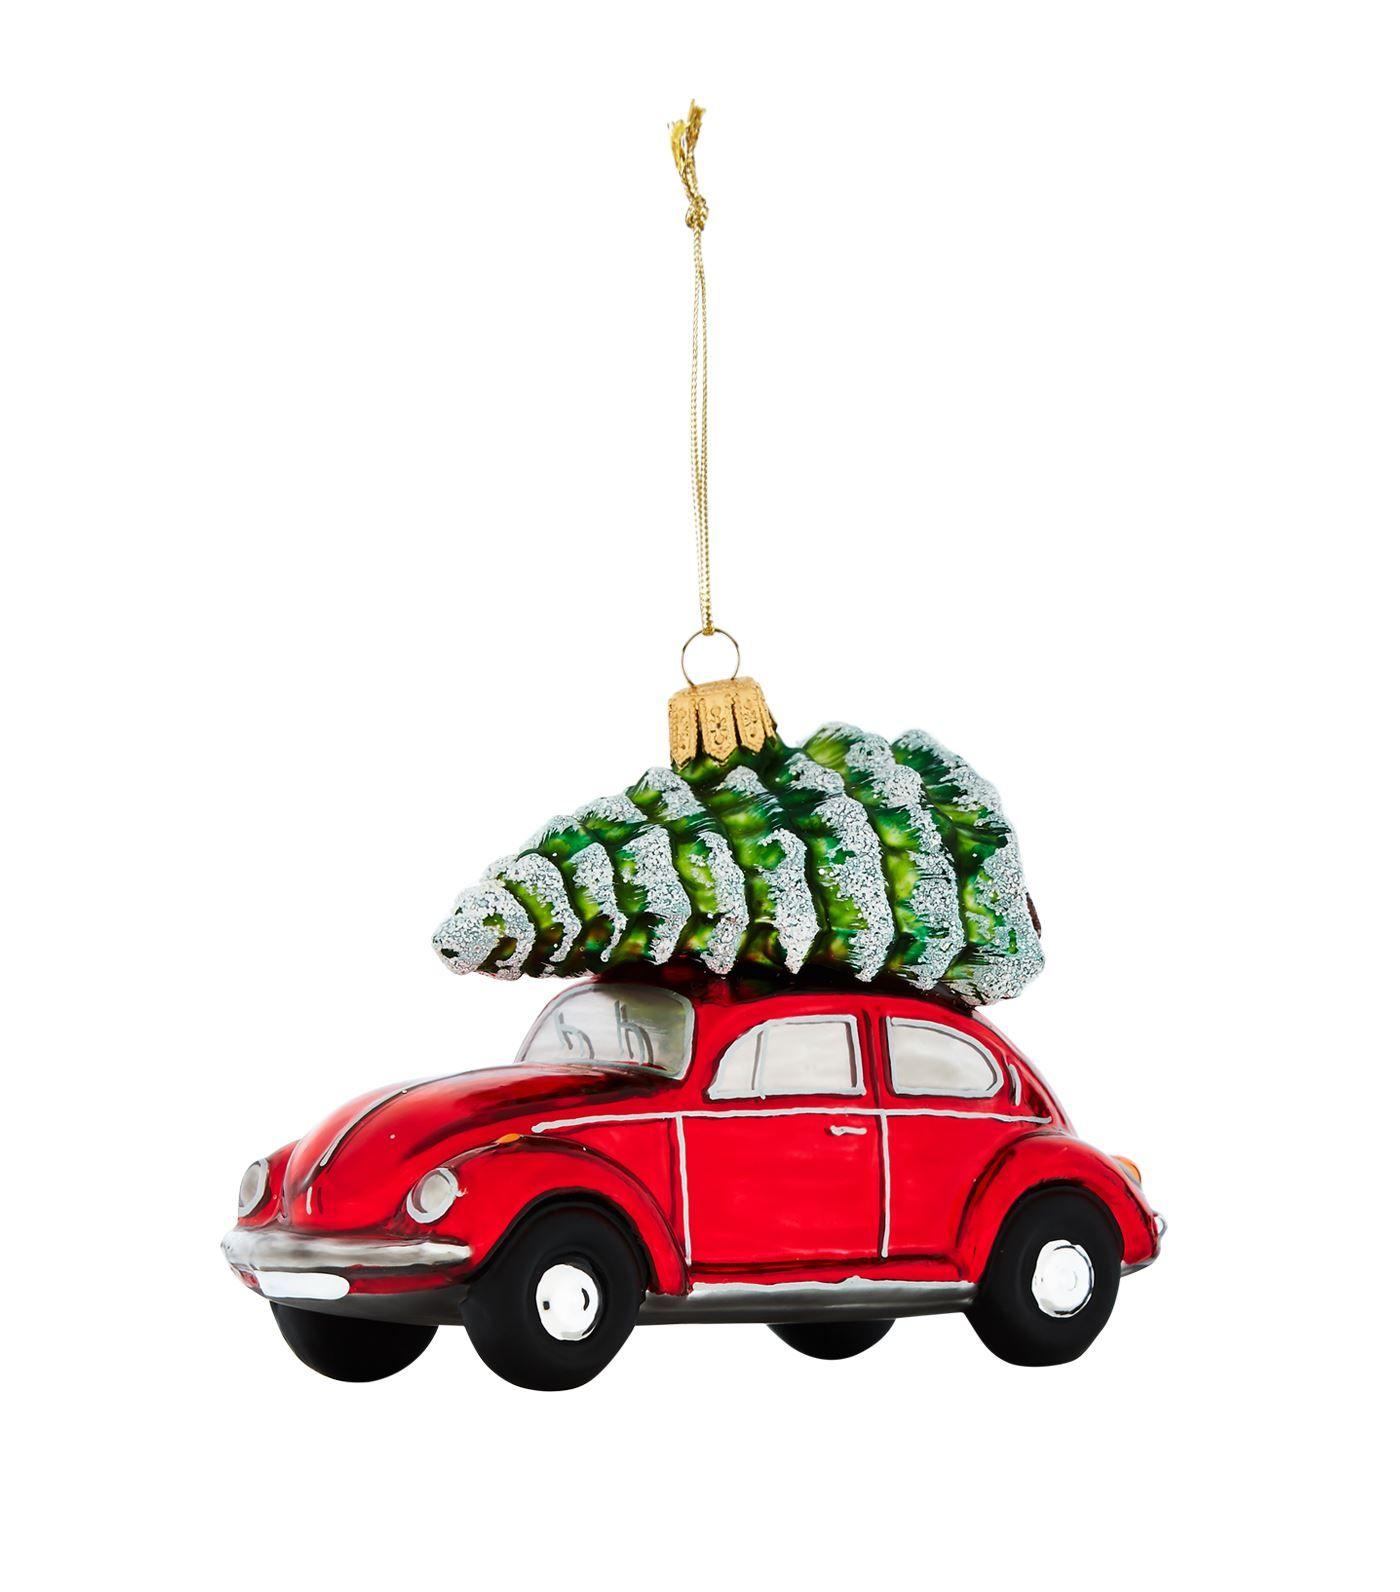 Harrods Vw Beetle With Tree Bauble Decor